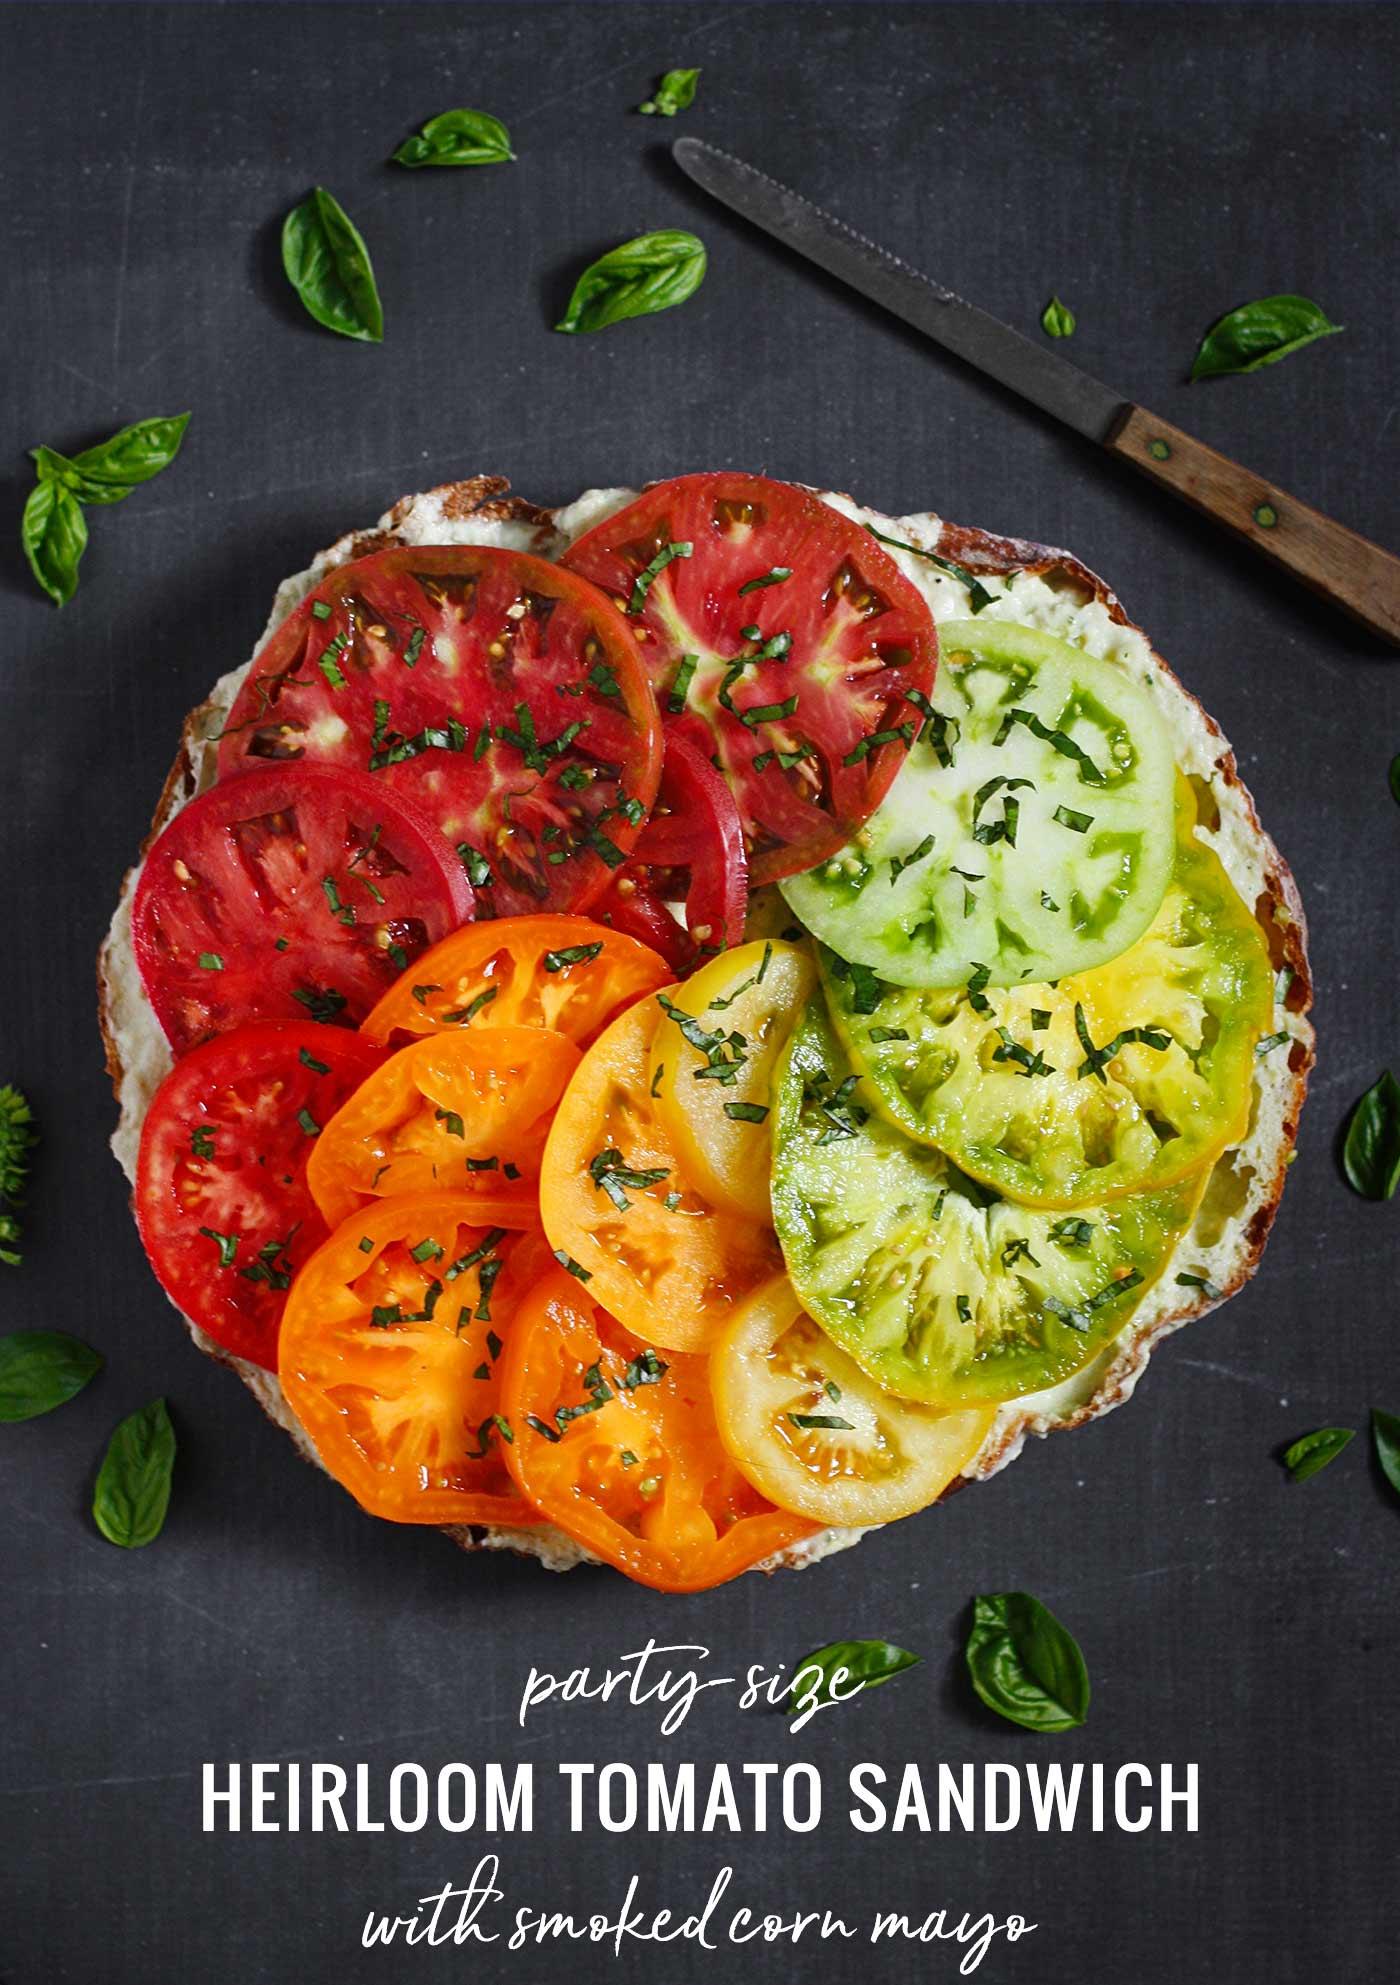 Heirloom Tomato Sandwich with rainbow tomatoes